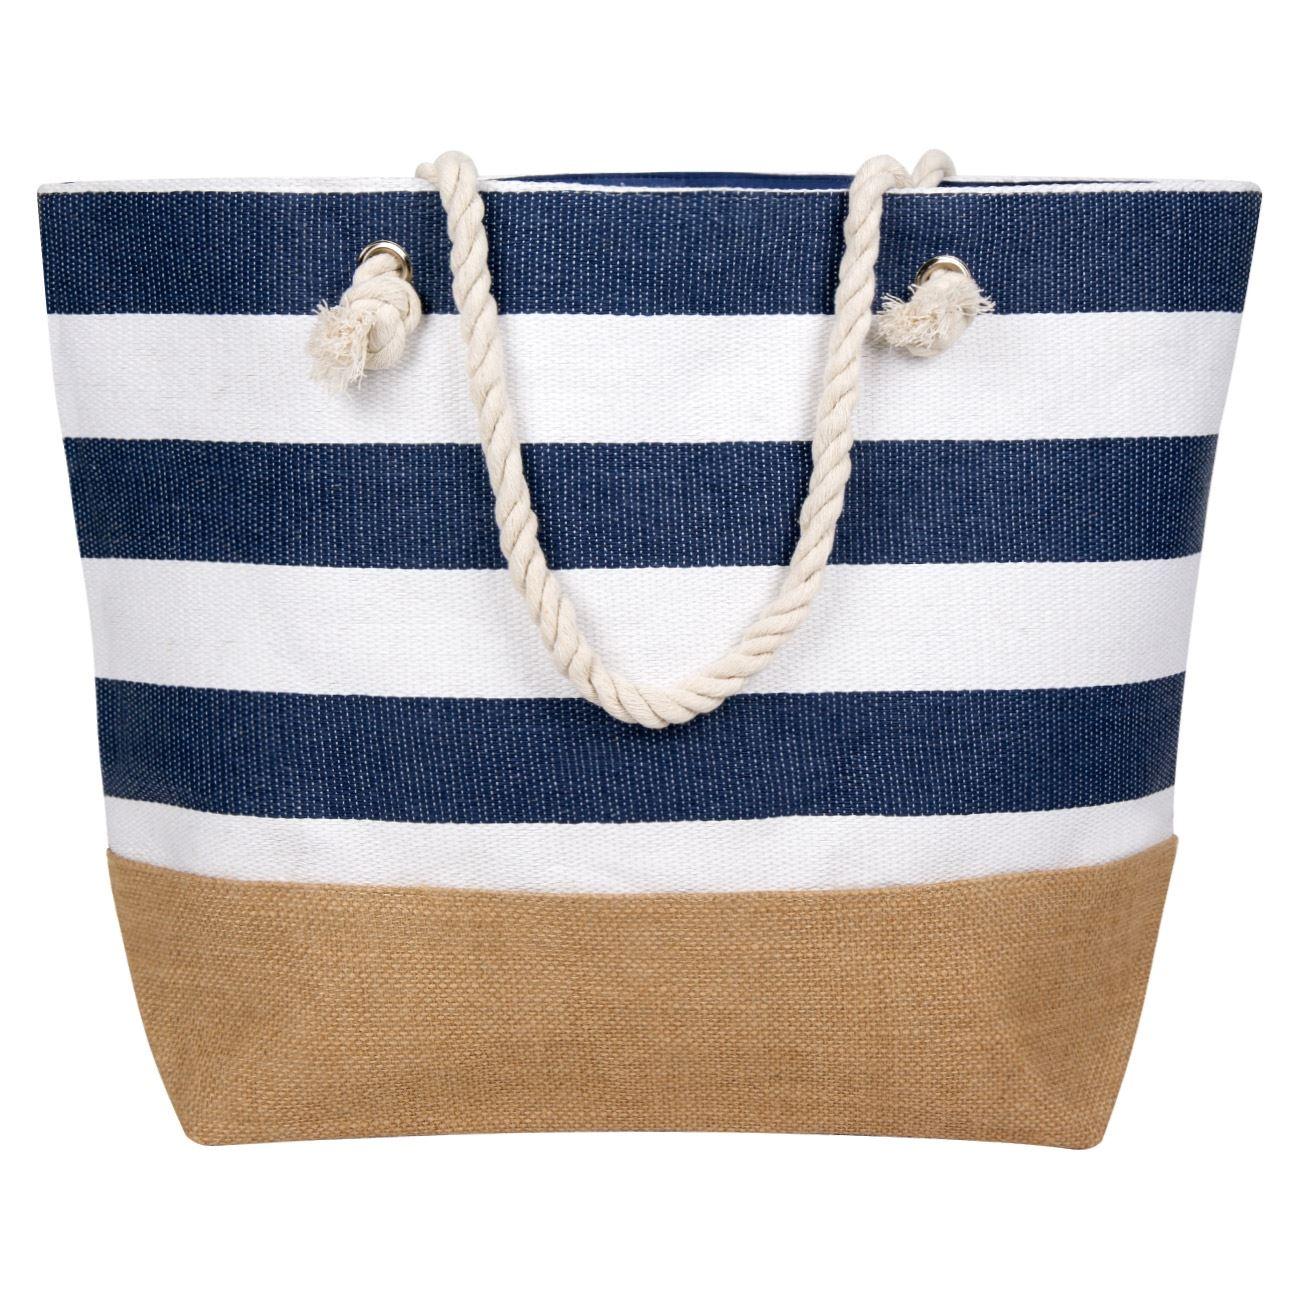 3ed85ac9b9 Τσάντα Θαλάσσης Ψάθινη Λευκή Μπλε Ριγέ 56 εκ.   Τσάντες Ψάθινες